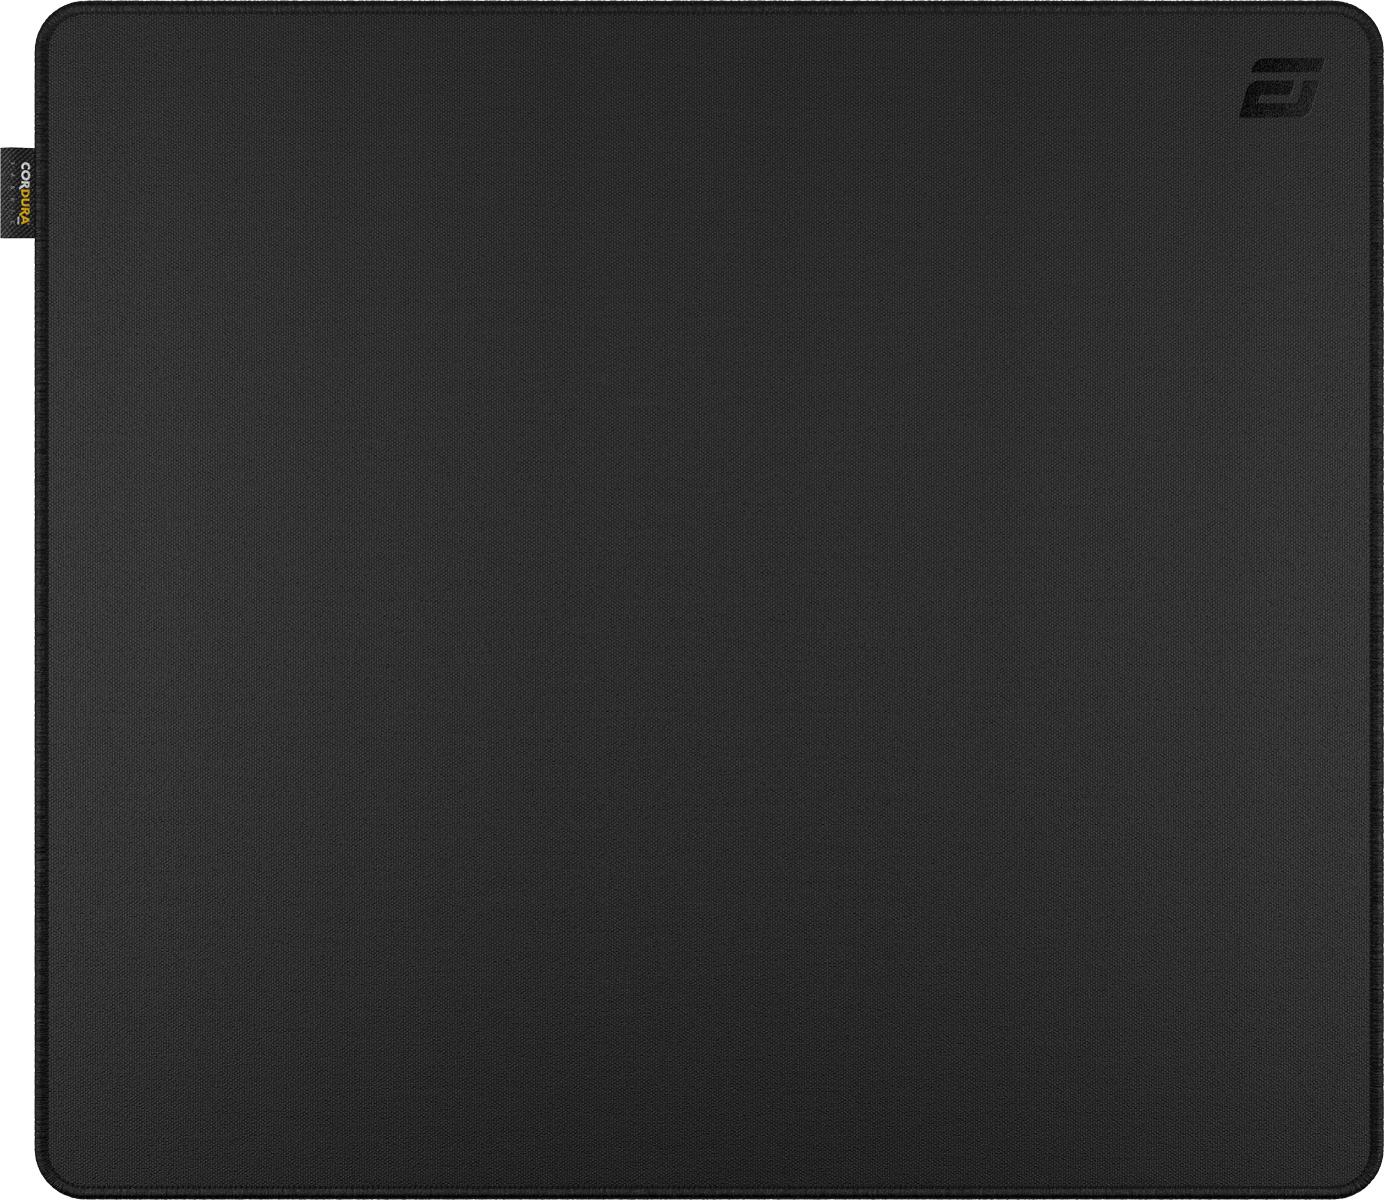 Endgame Gear MPC-450 Cordura Gaming Mousepad - Black - CASEKING 1.28.63.12.004